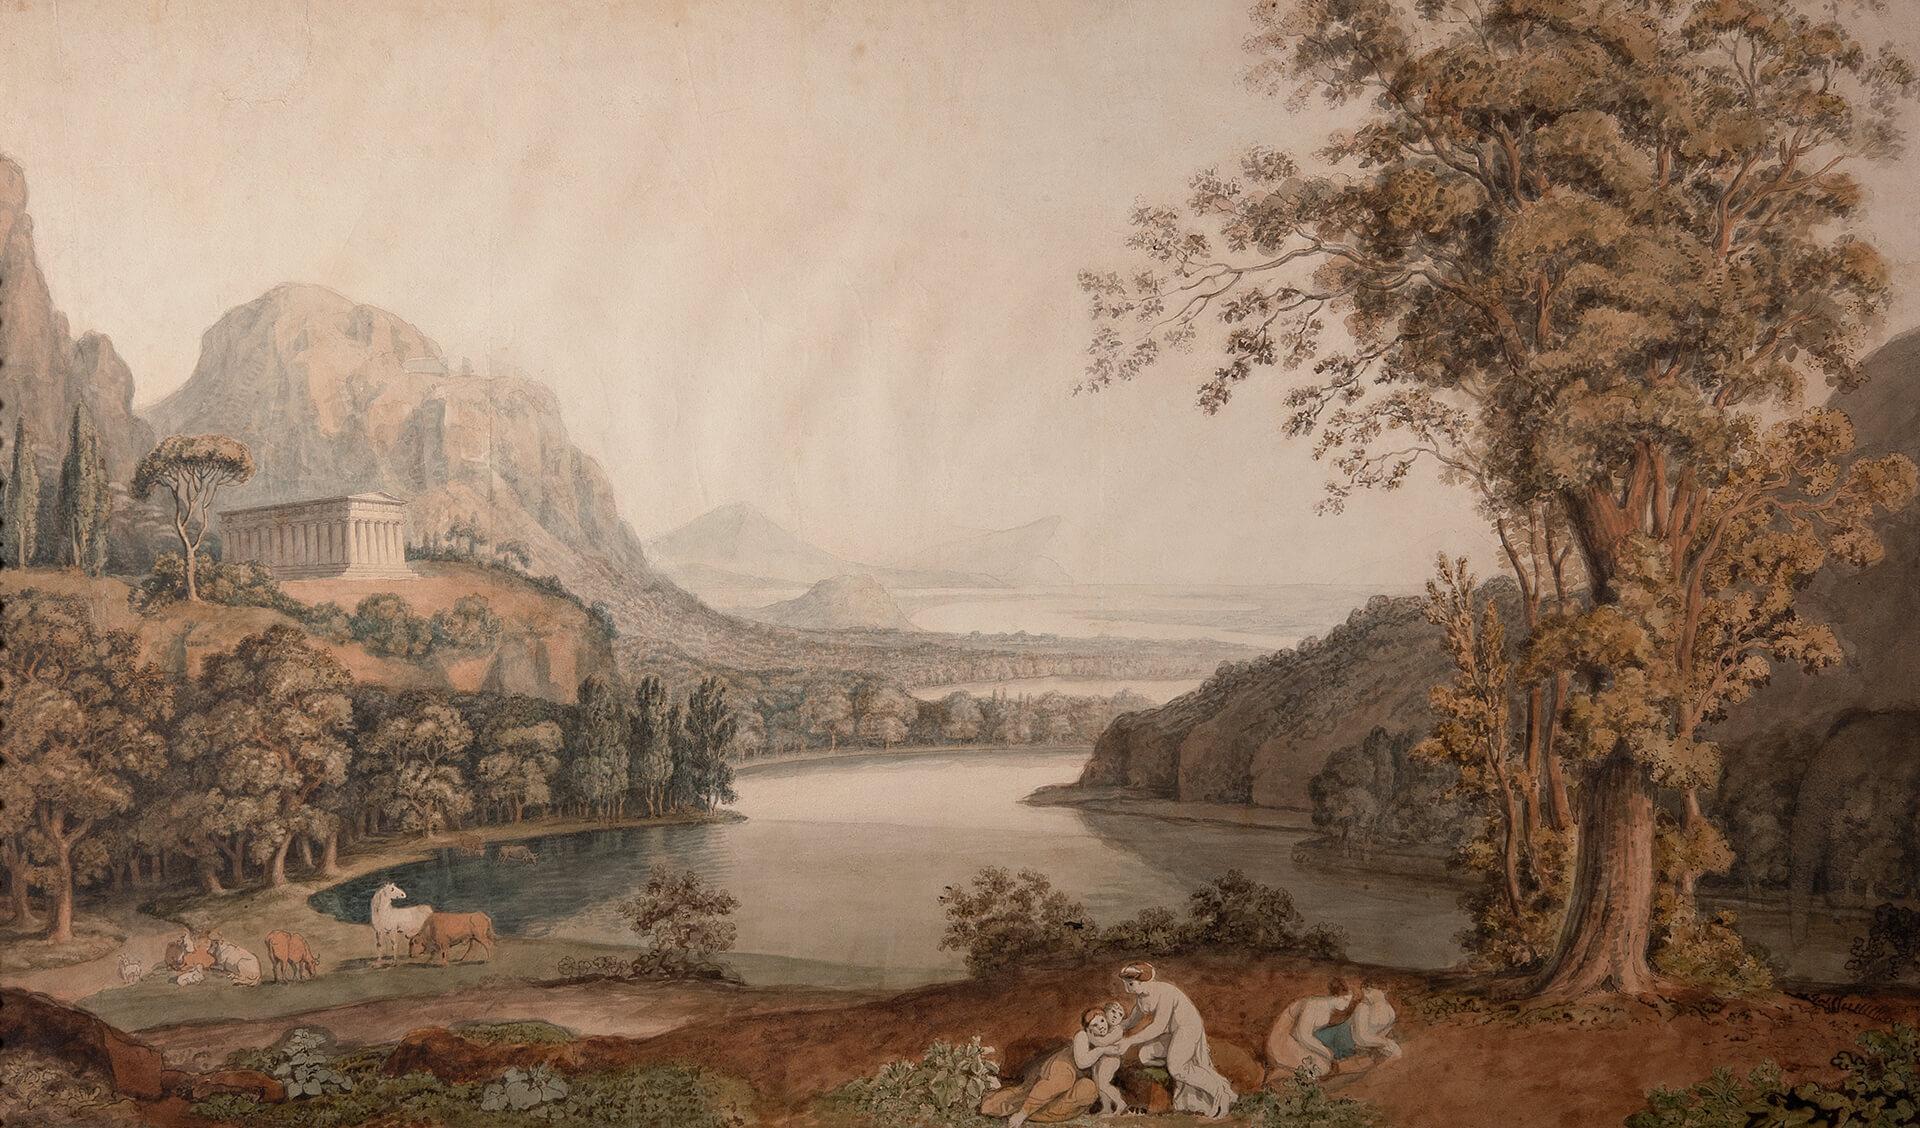 J. H. W. Tischbein, Paesaggio ideale con tempio. 1786/88